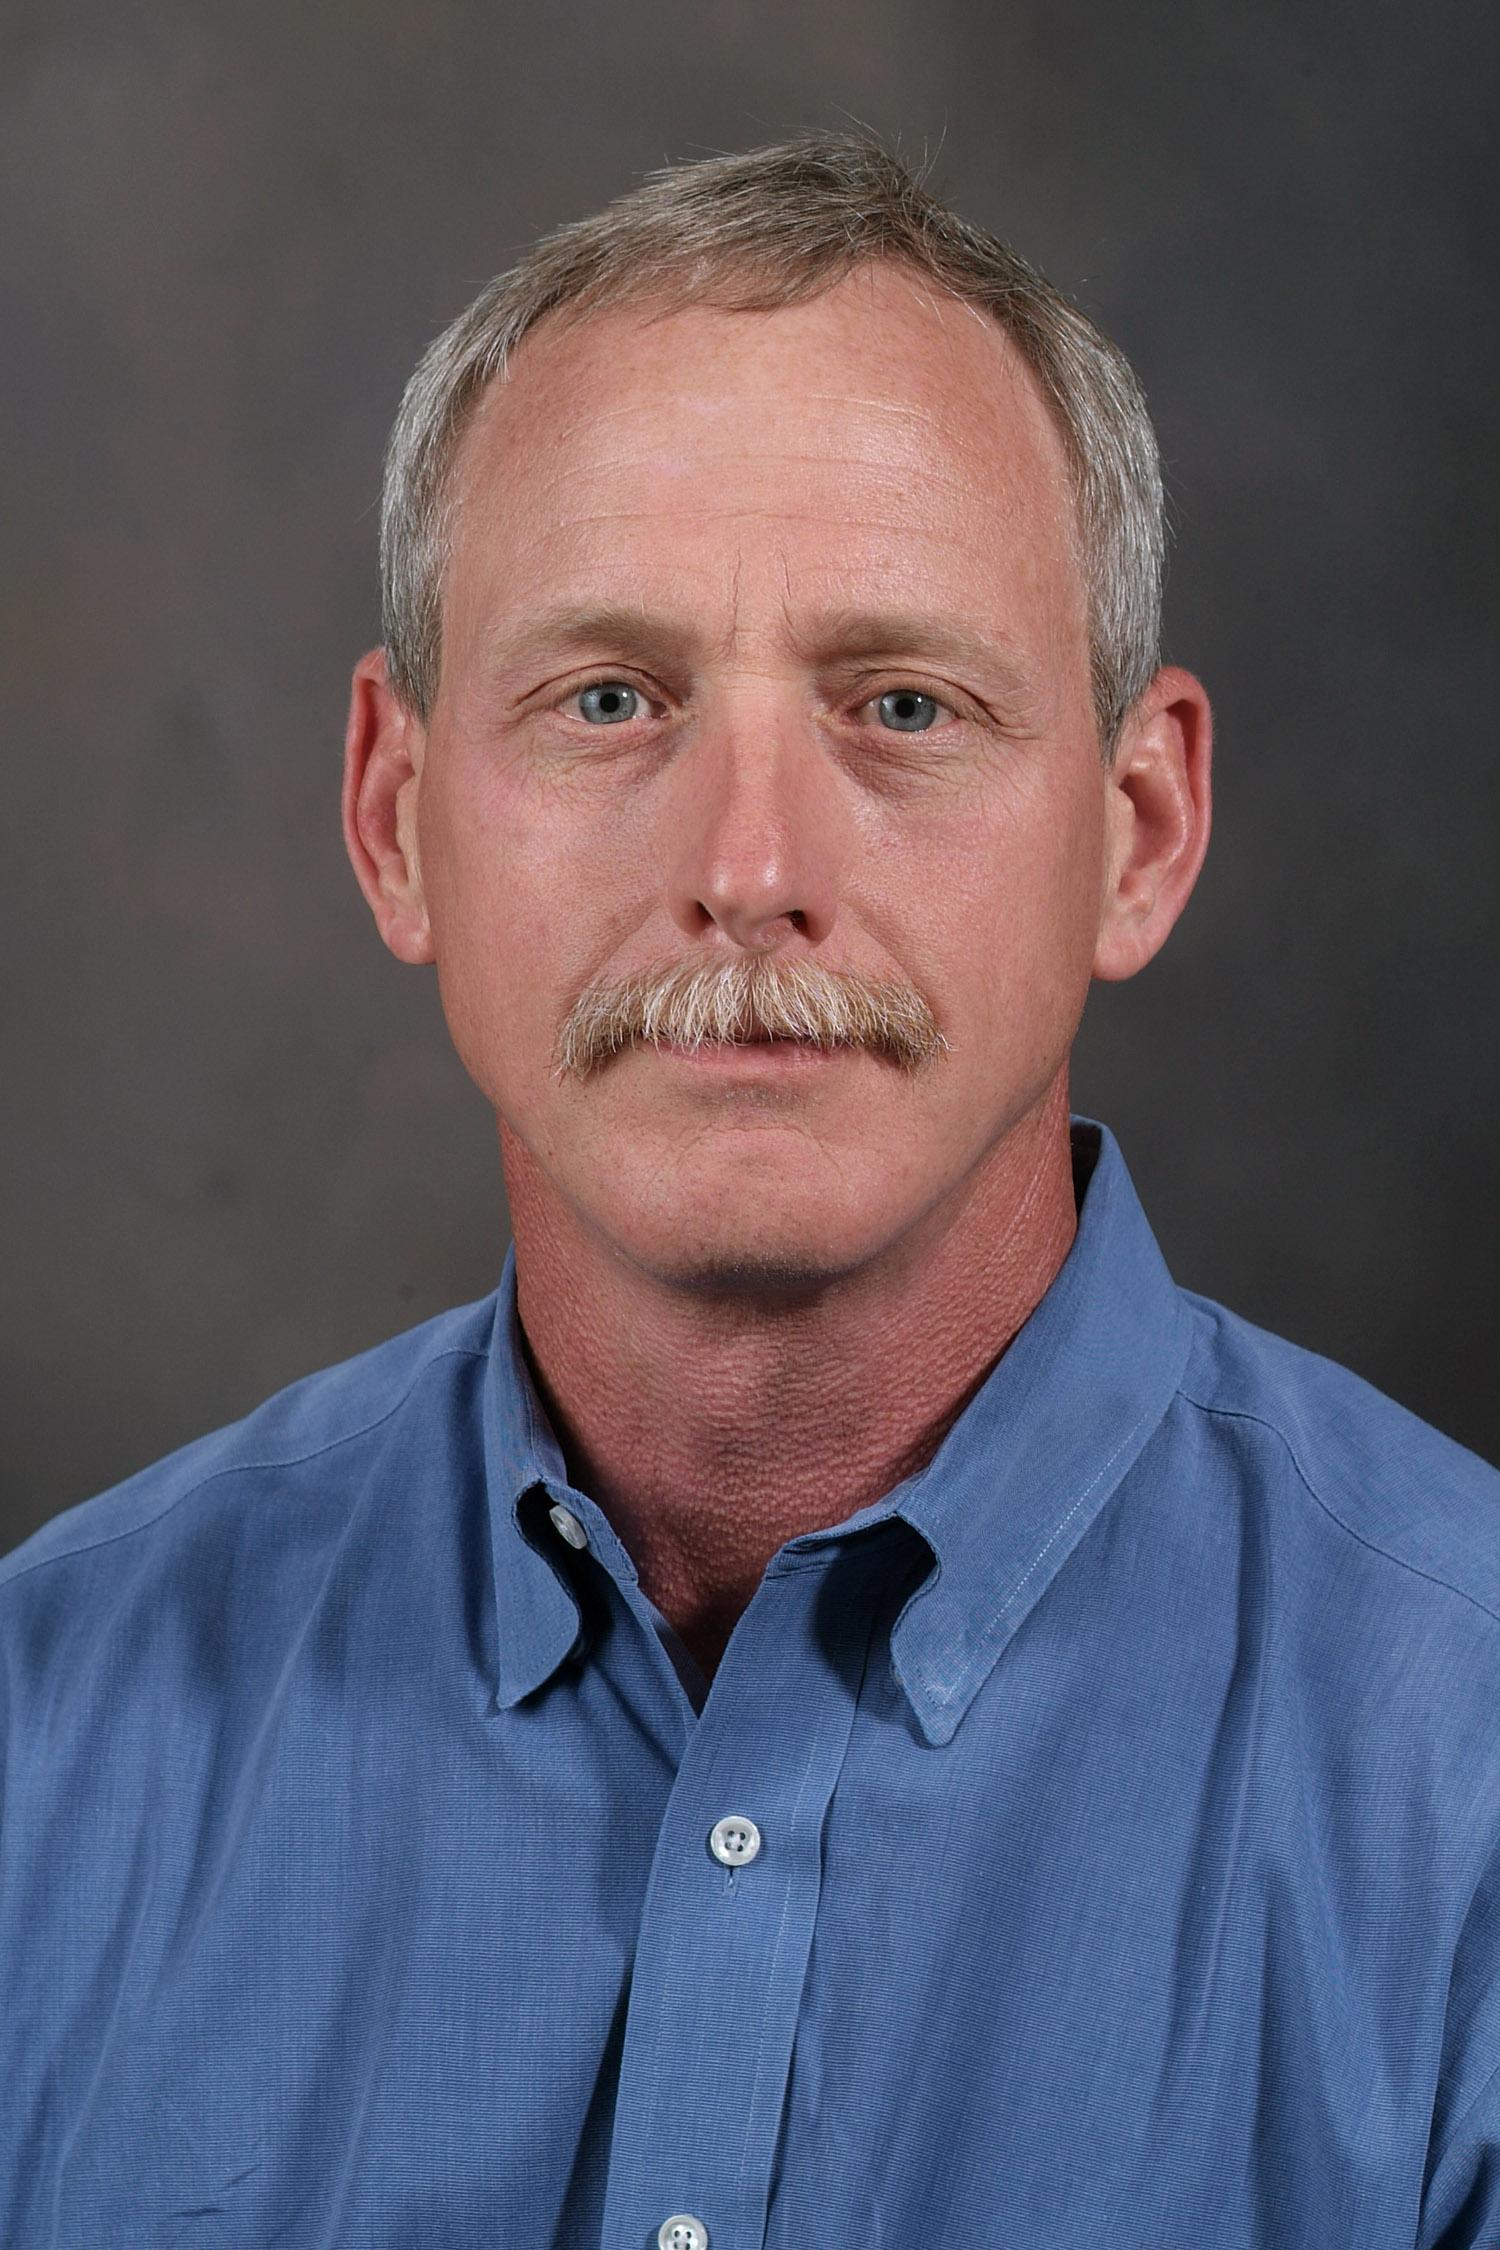 Dr. David Kerns